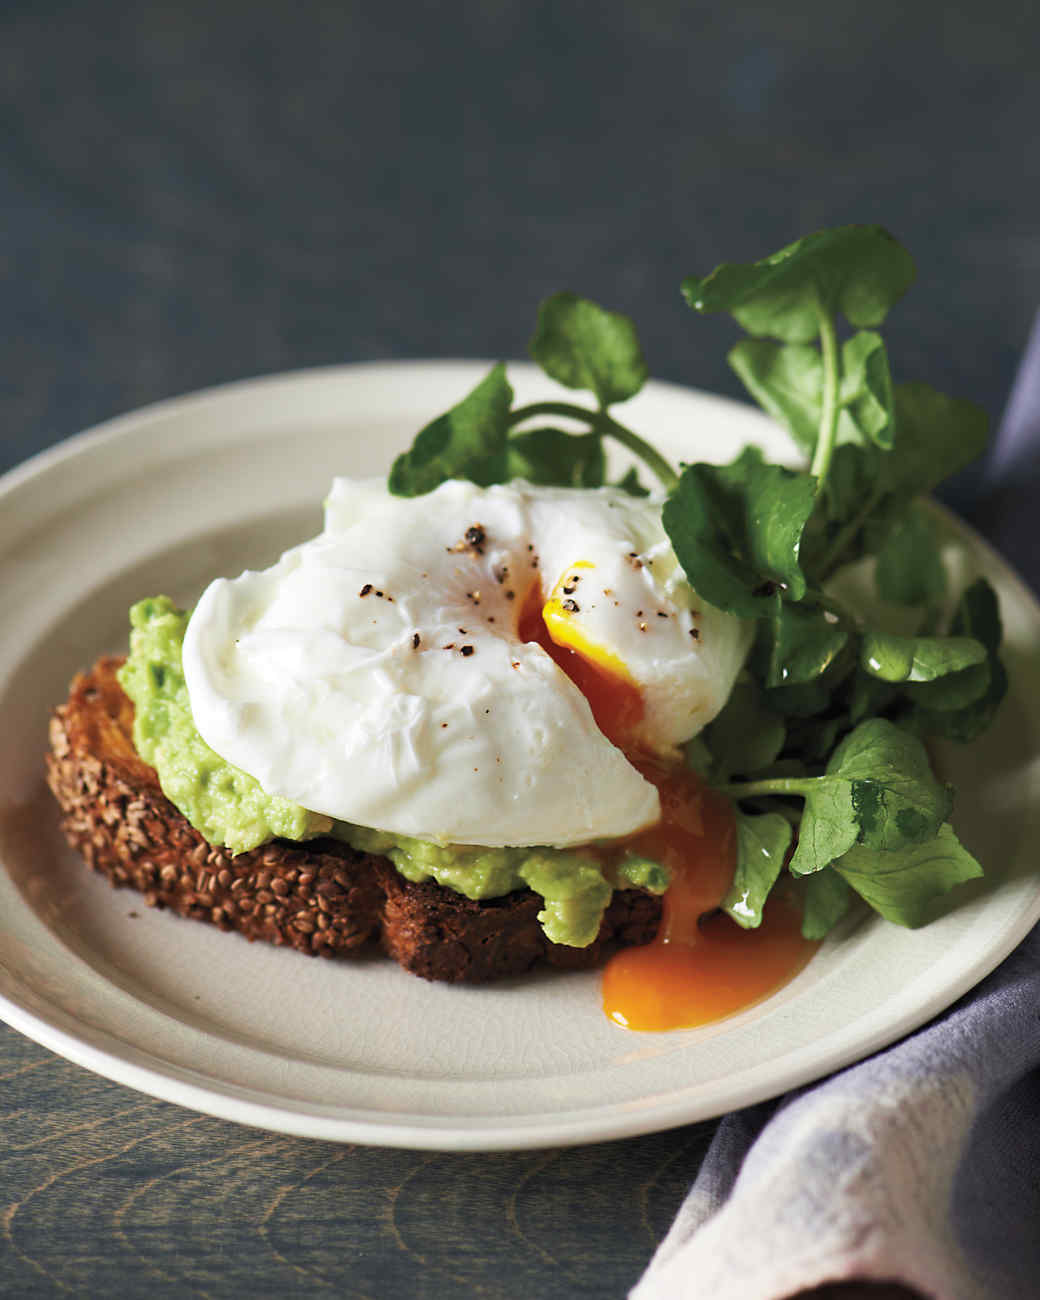 sesame-toasts-poached-egg-avocado-md109548.jpg